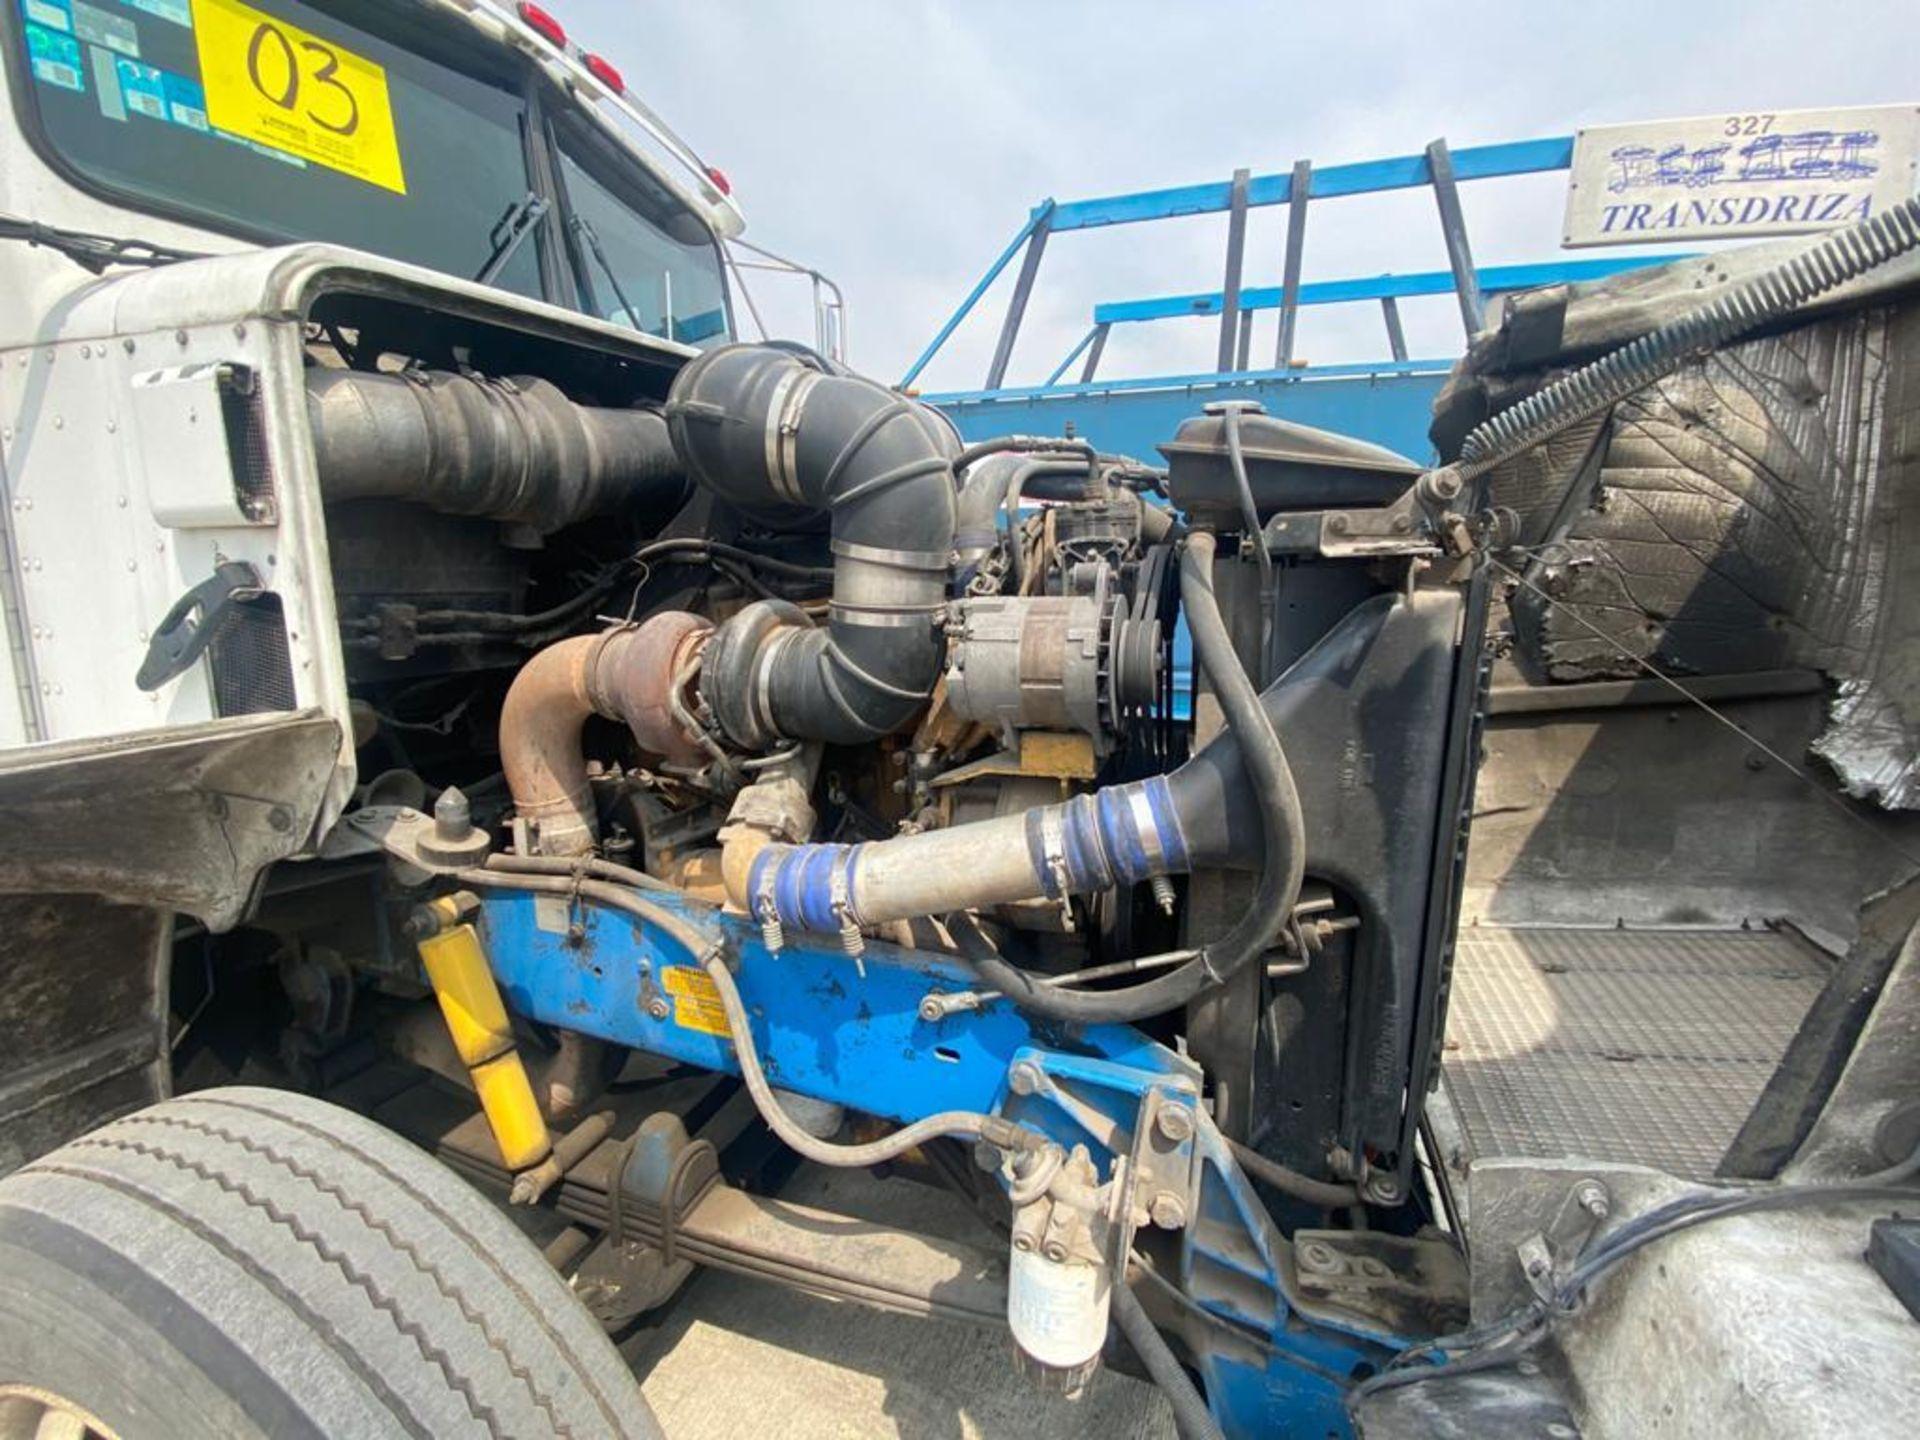 1999 Kenworth Sleeper truck tractor, standard transmission of 18 speeds - Image 61 of 62